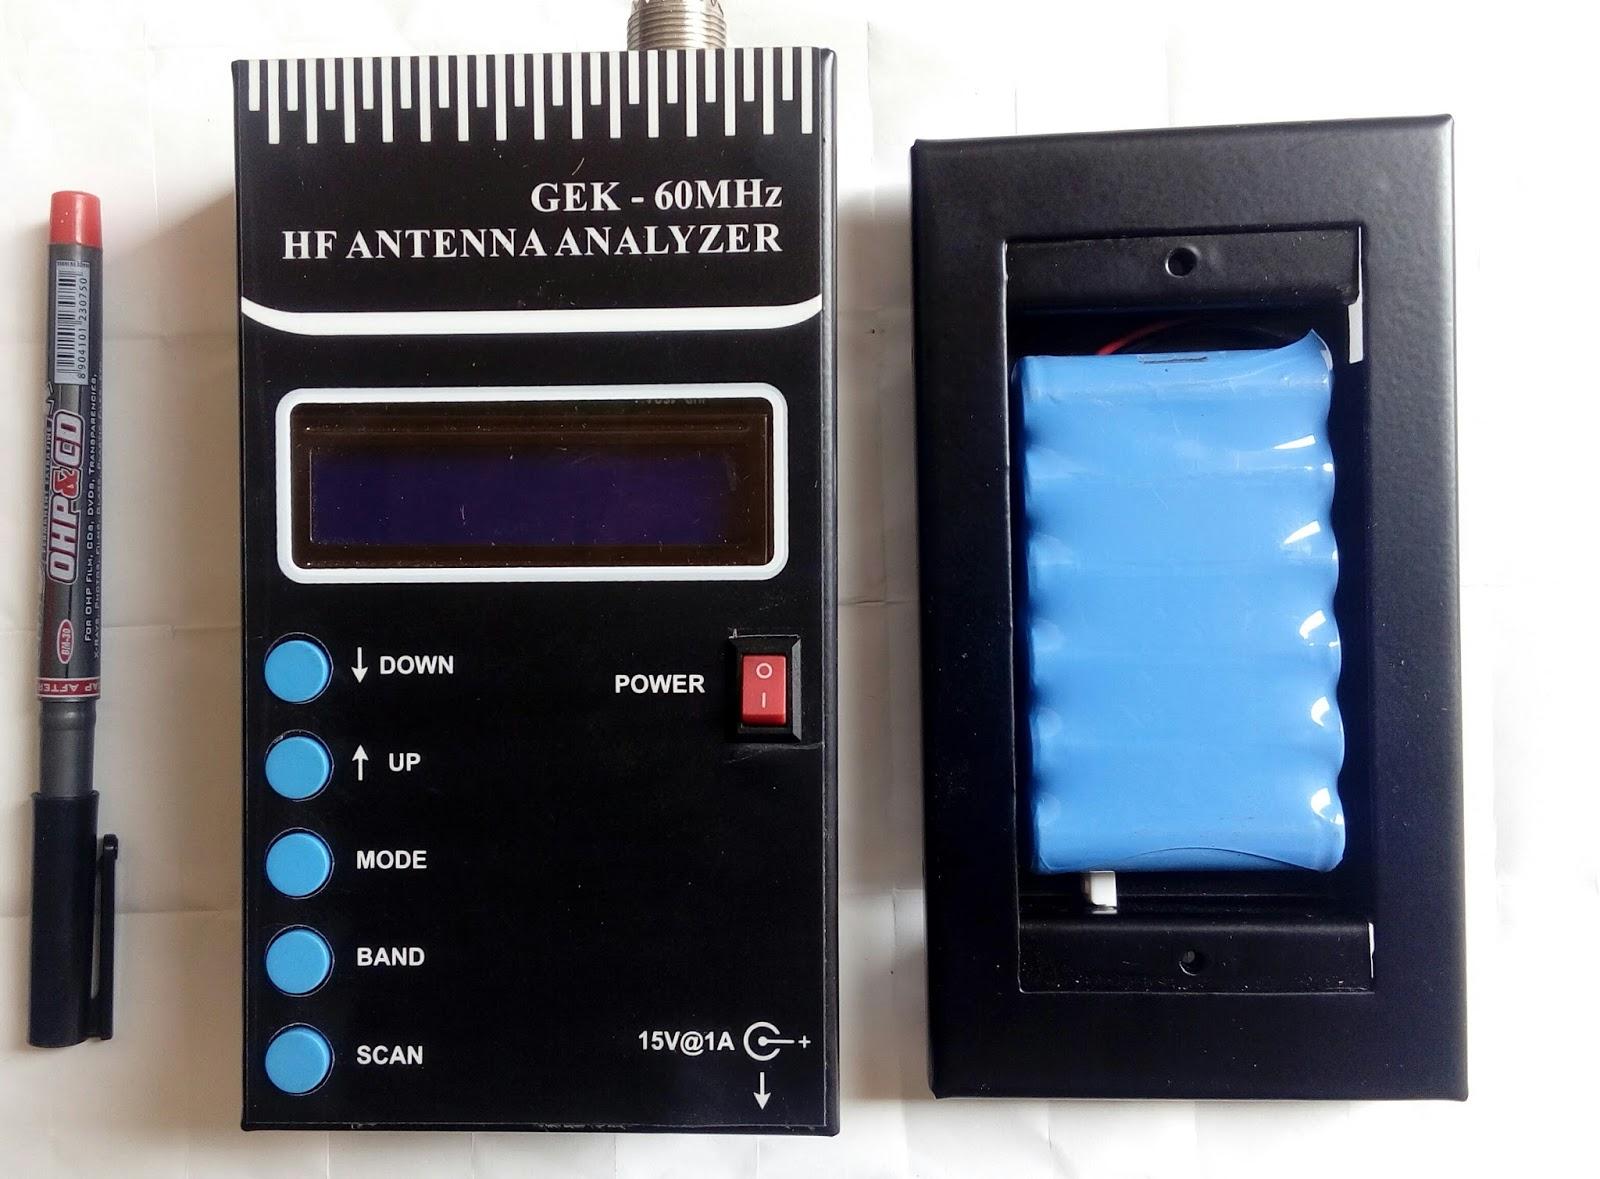 Home Brew Corner: GEK - Antenna analyzer